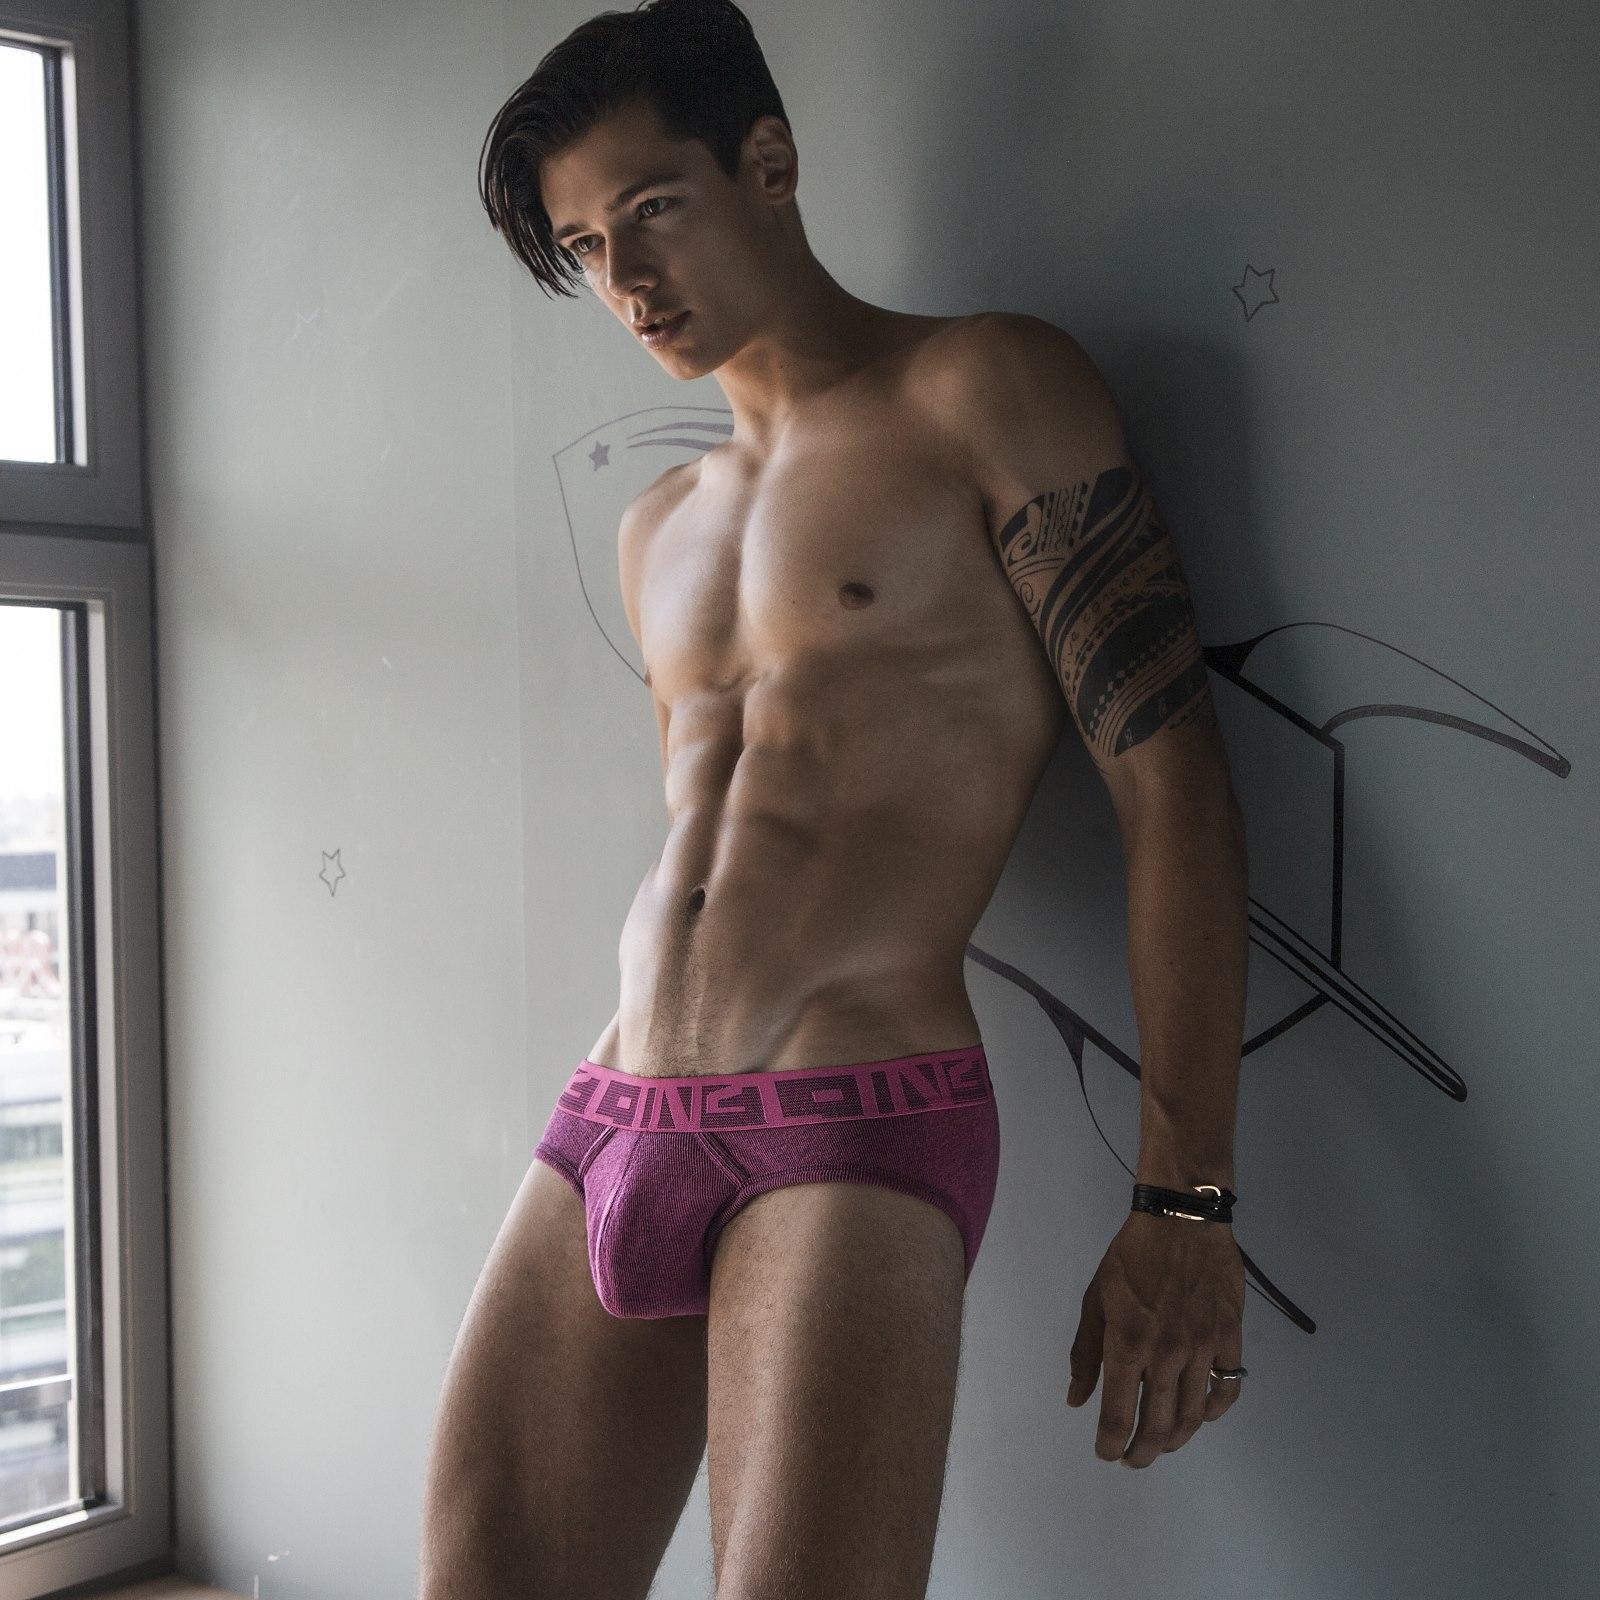 Gay boxer porn military i039d never gargled a 9